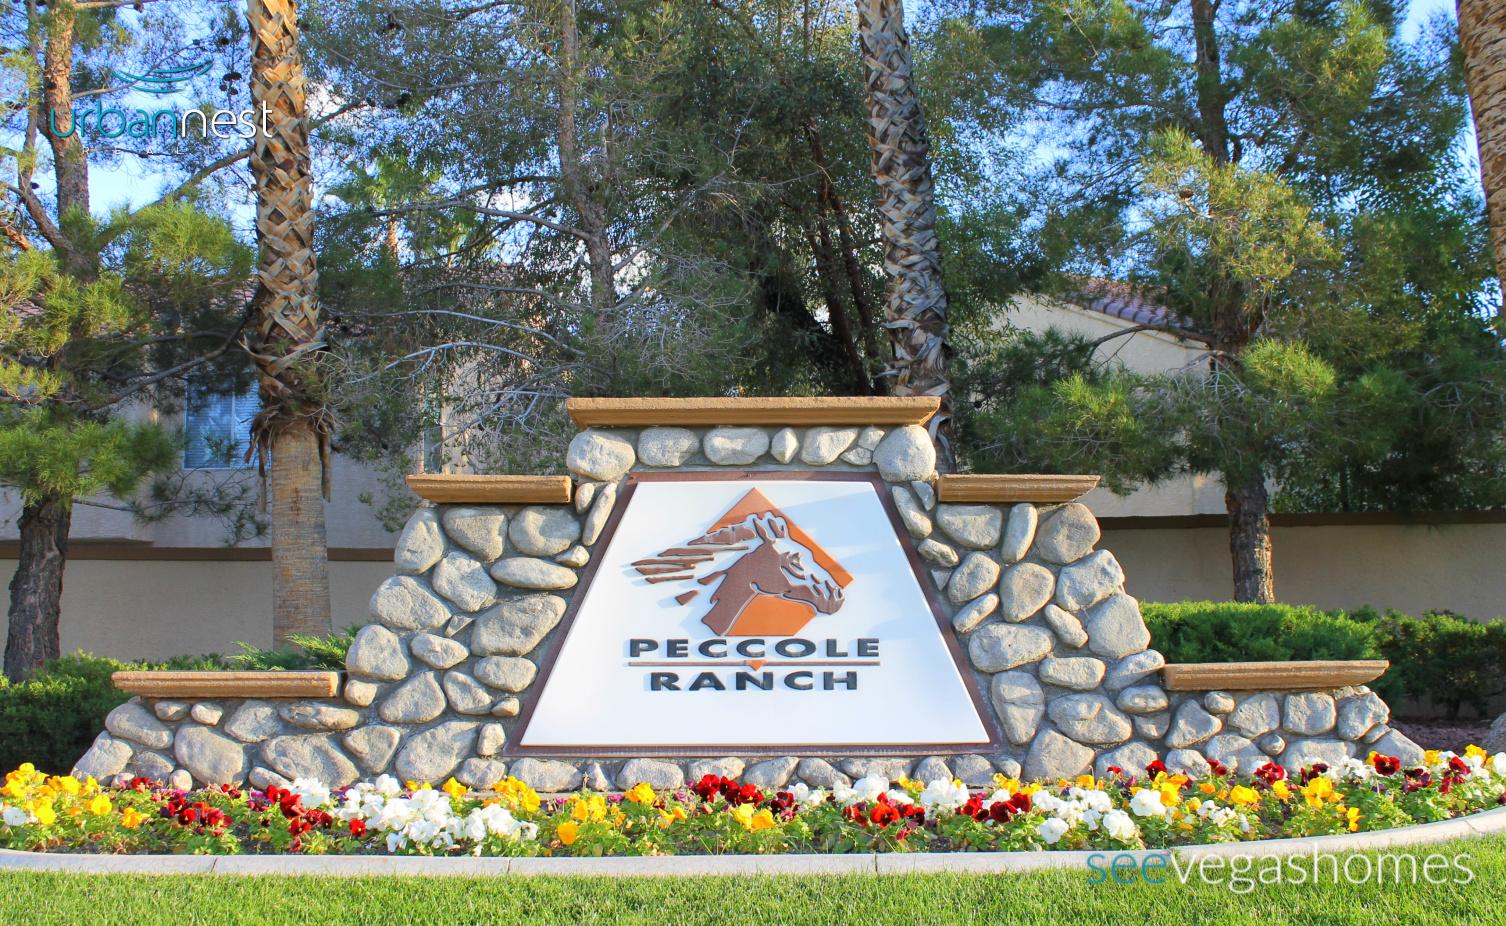 Peccole_Ranch_Las_Vegas_89117_SeeVegasHomes